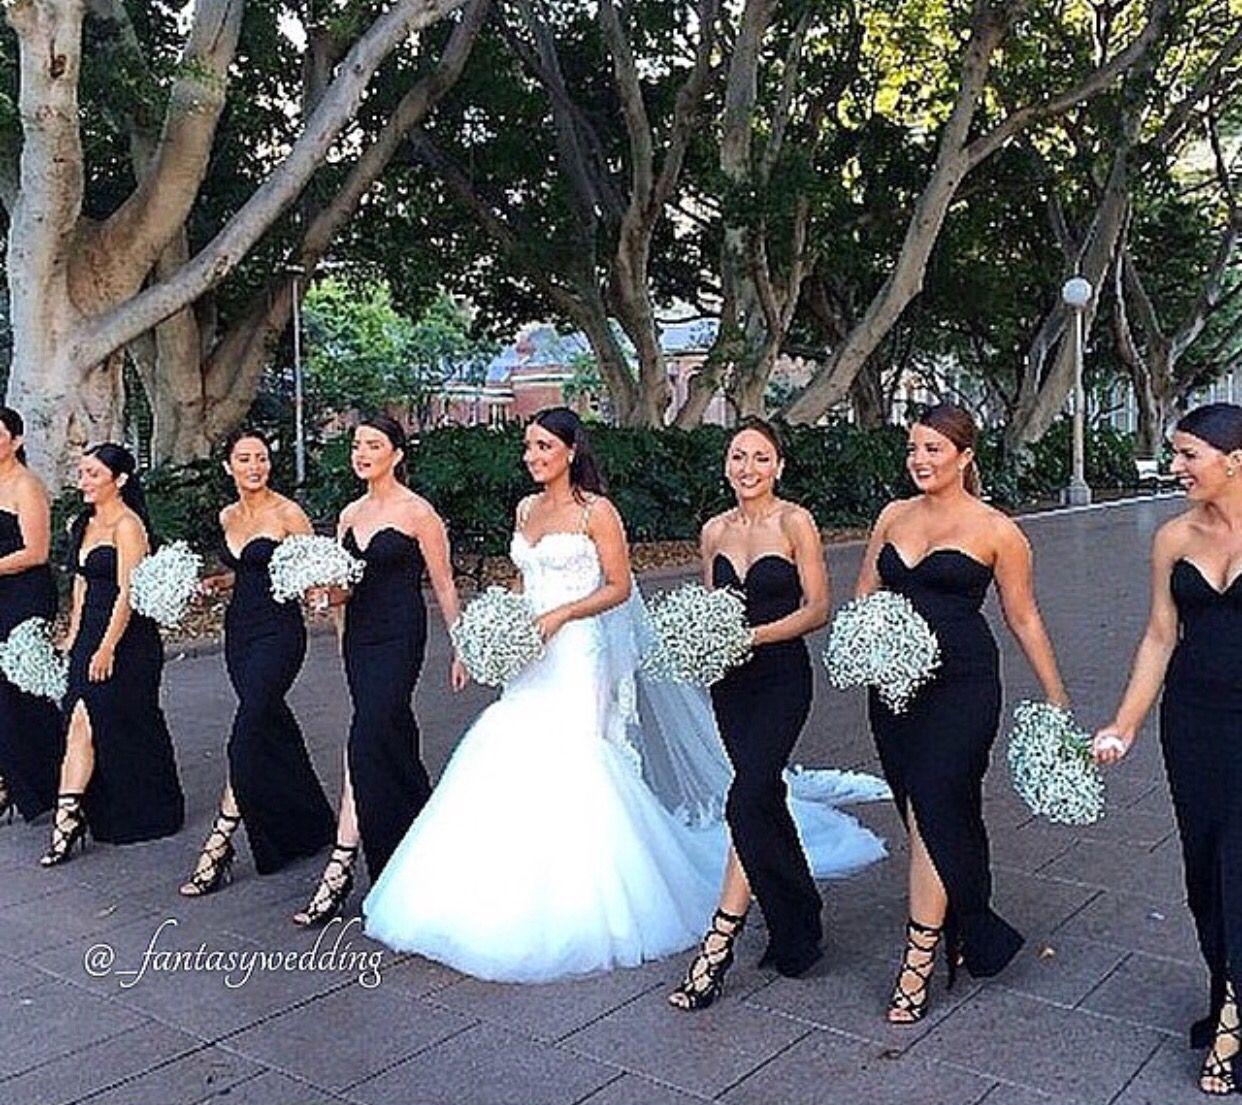 Black Bridesmaid Dress Mermaid Bridesmaid Dresses Bridesmaid Black Bridesmaids [ 1105 x 1242 Pixel ]